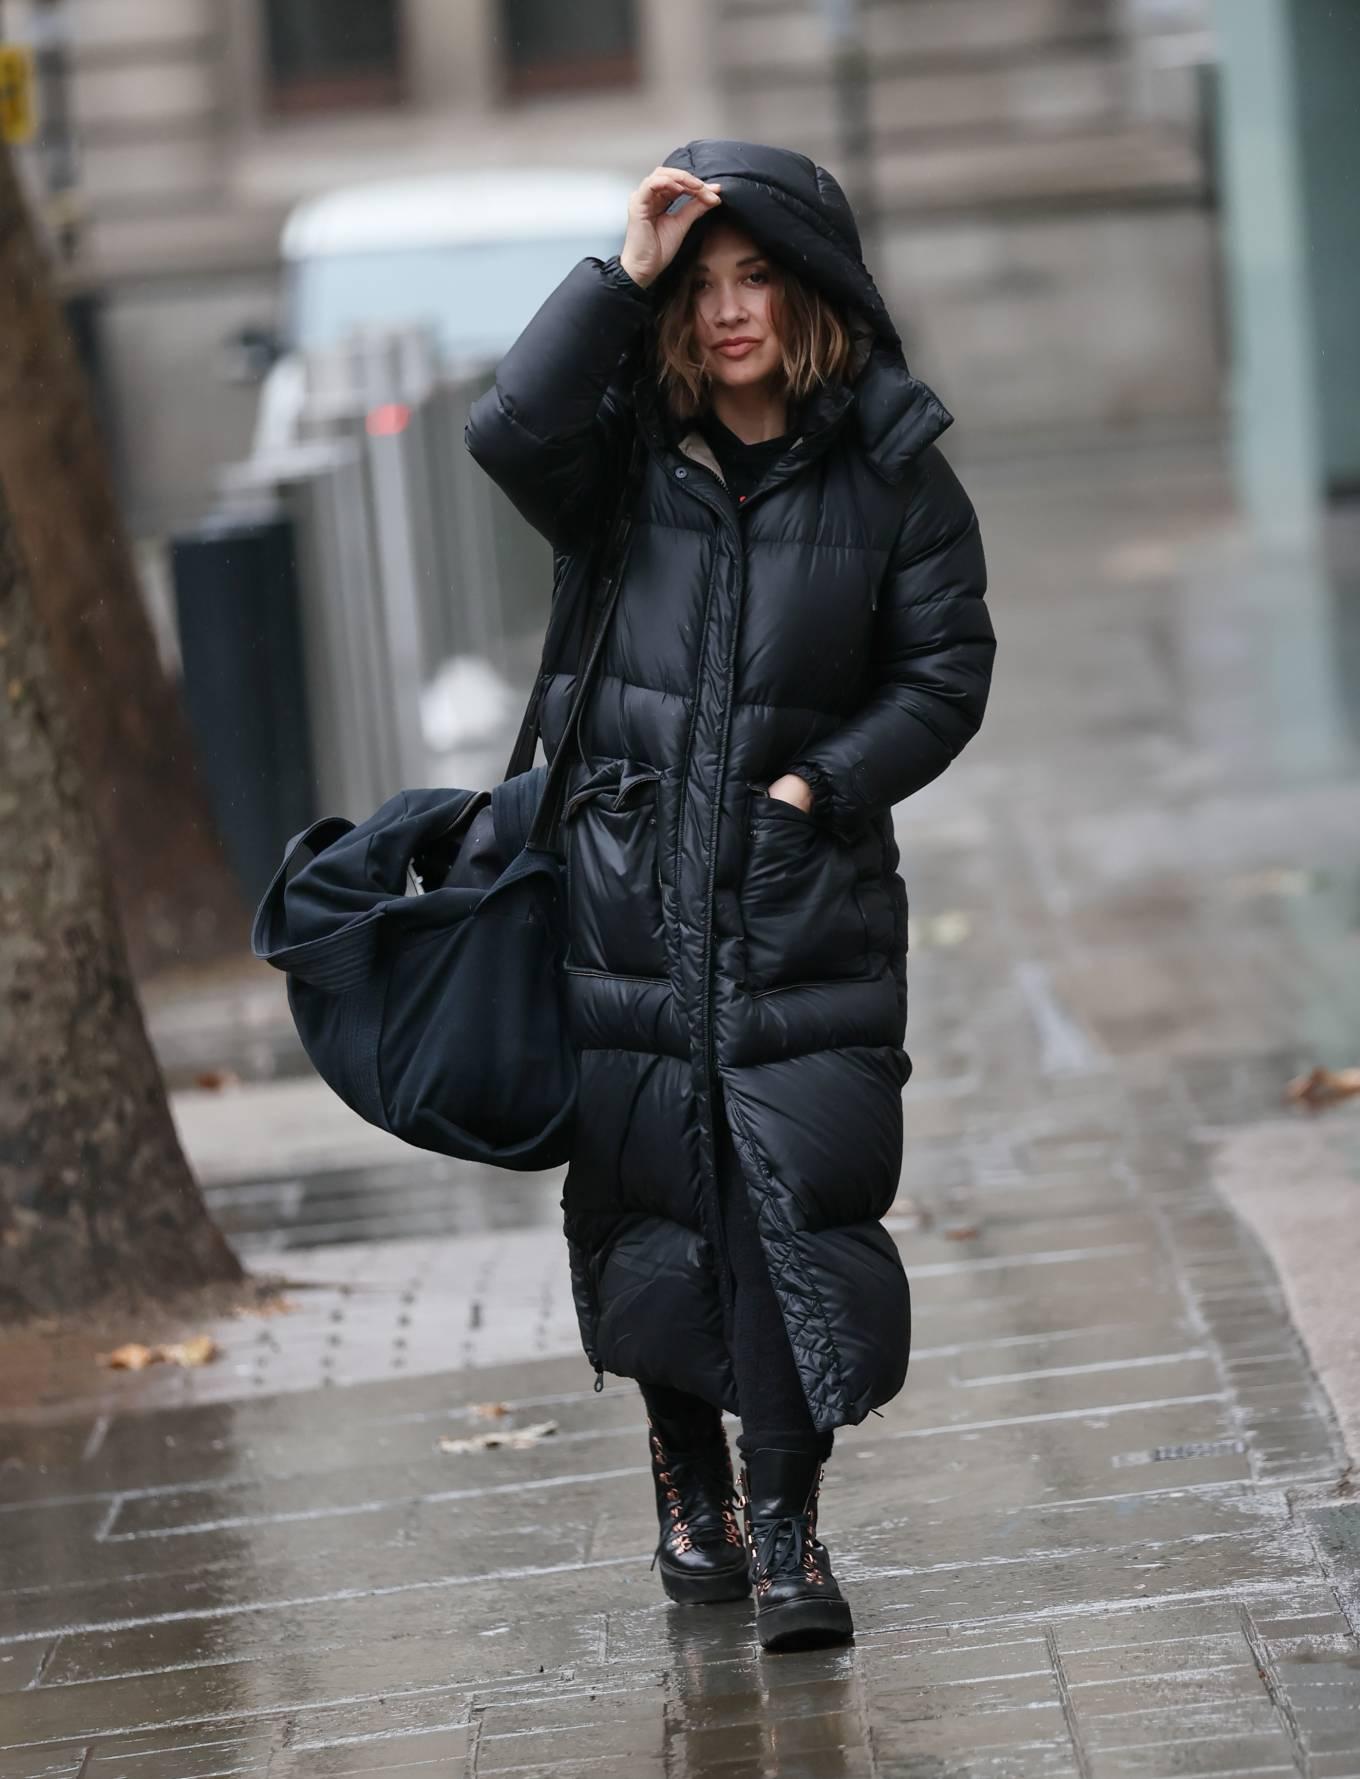 Myleene Klass 2020 : Myleene Klass – In a warm coat arriving at Smooth radio in London-01